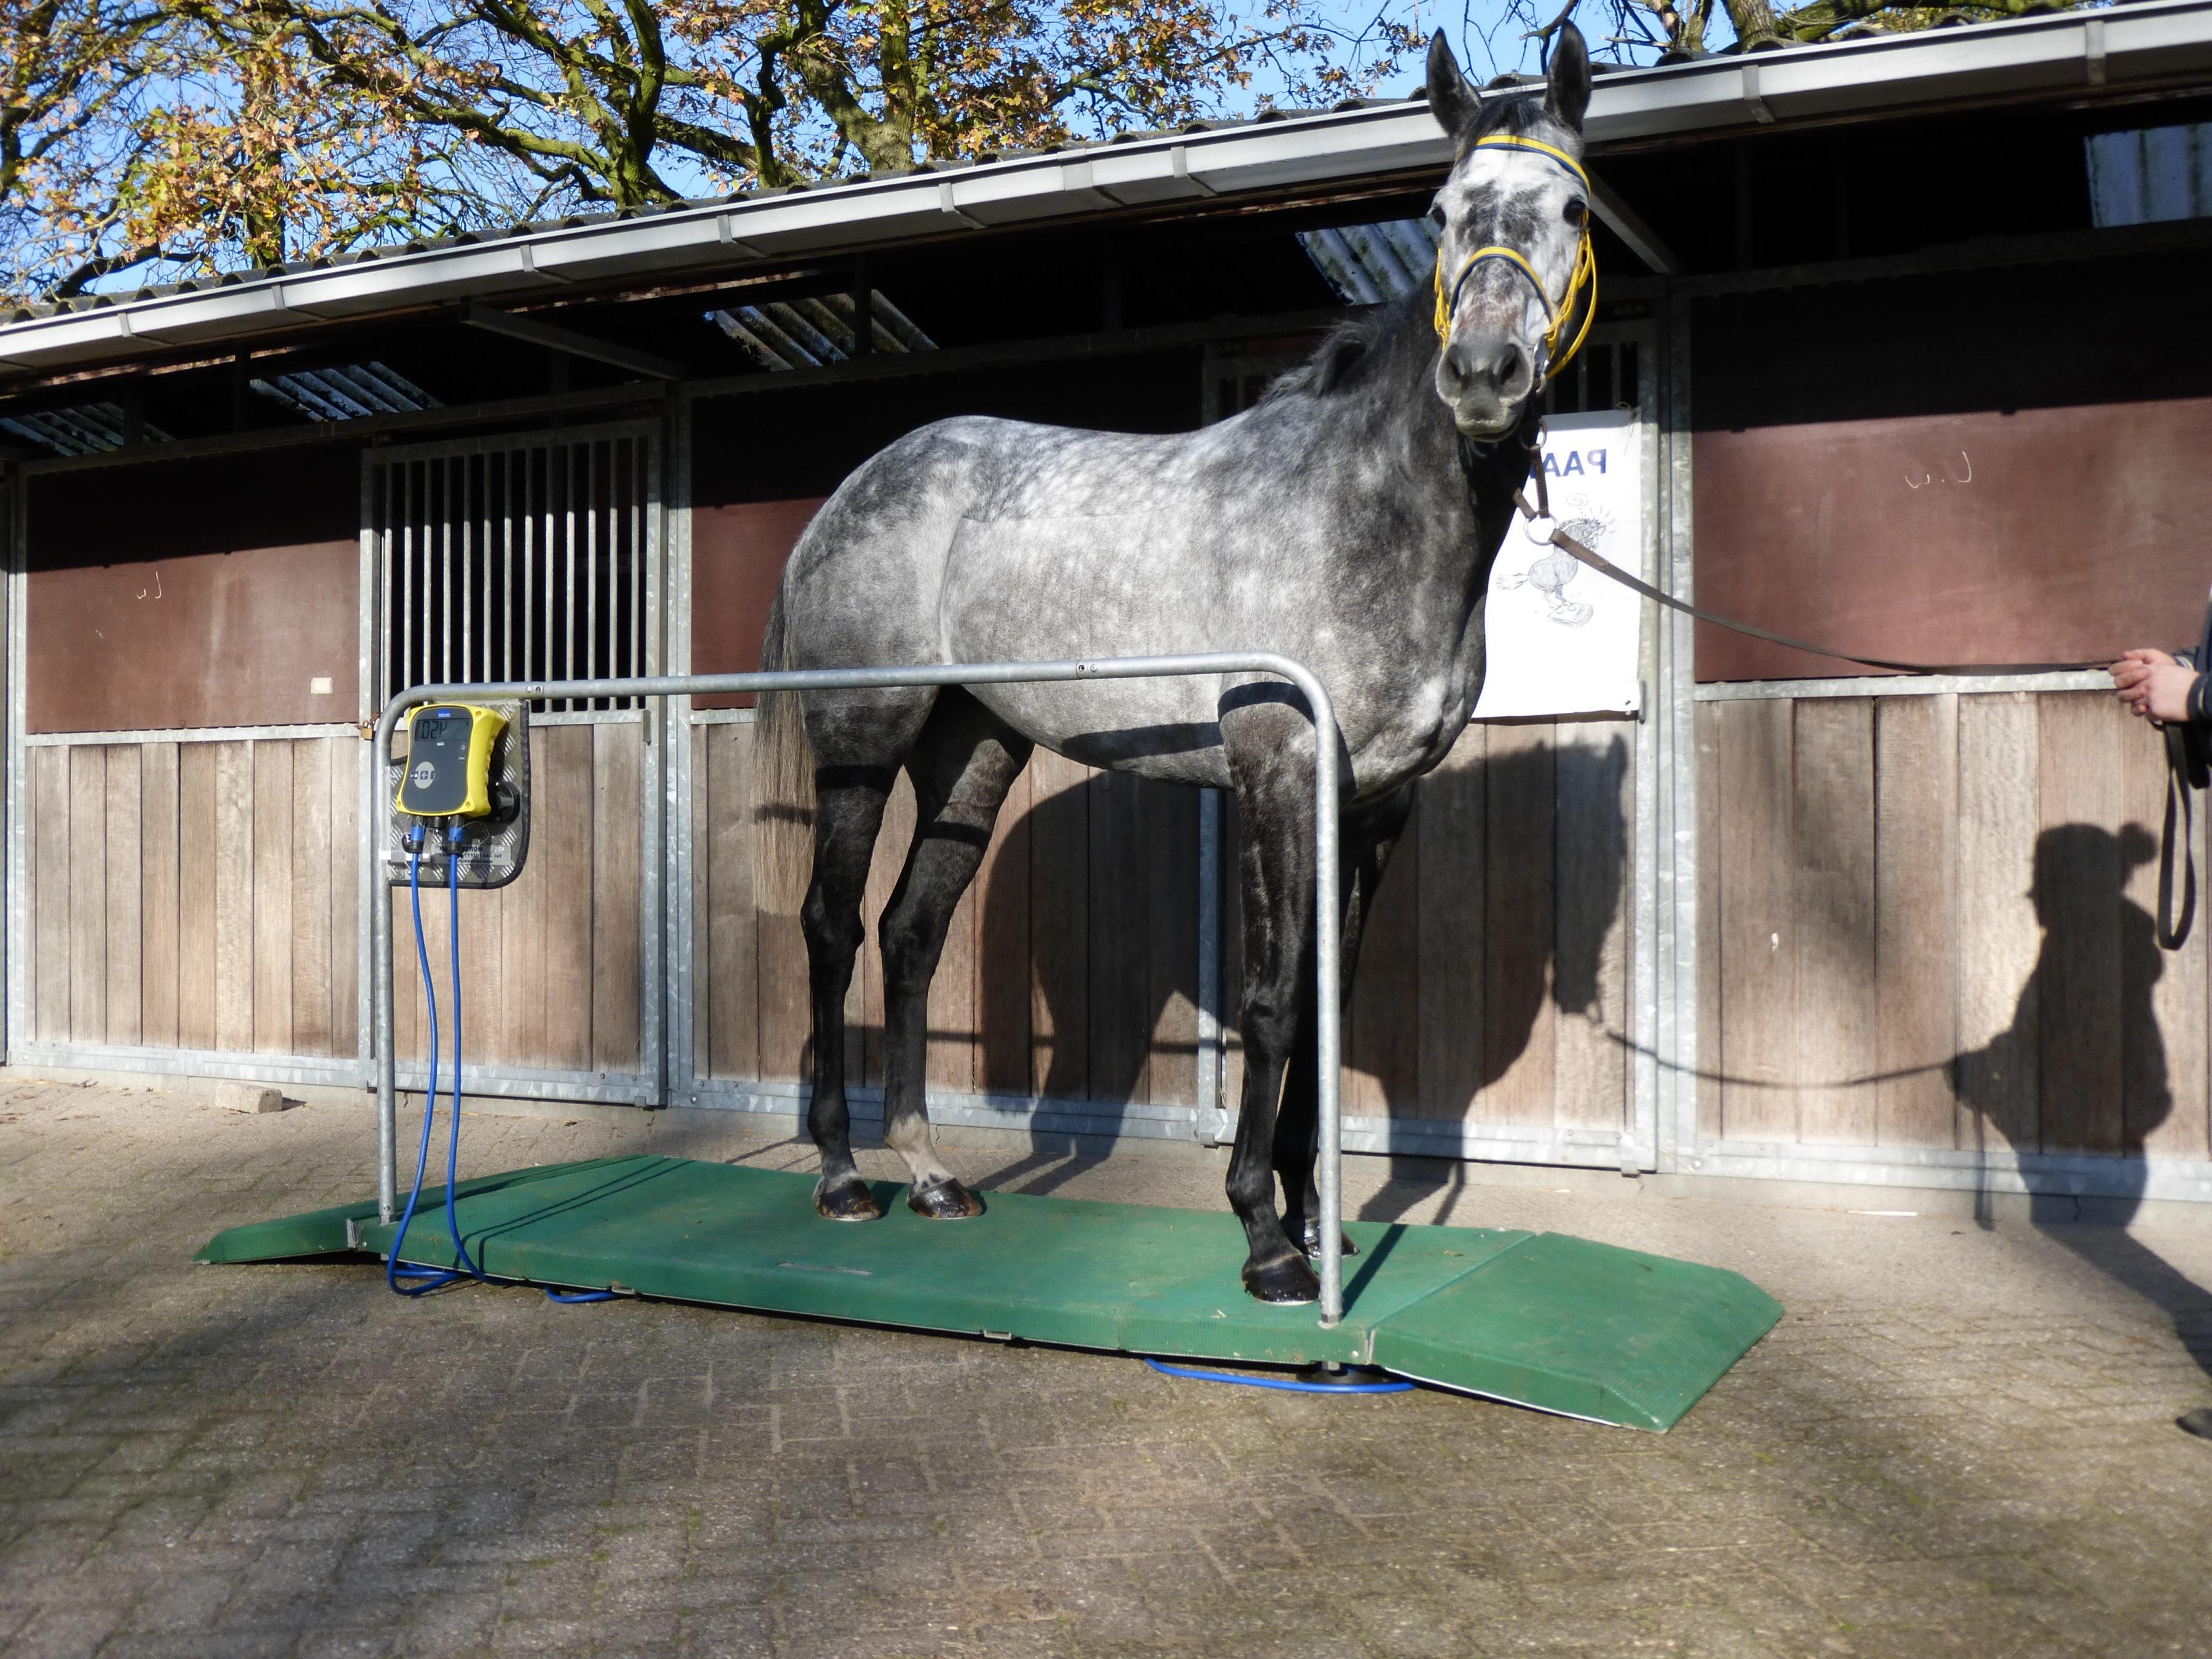 Schimmeltje poseert op mobiele paardenweegschaal Three Steps